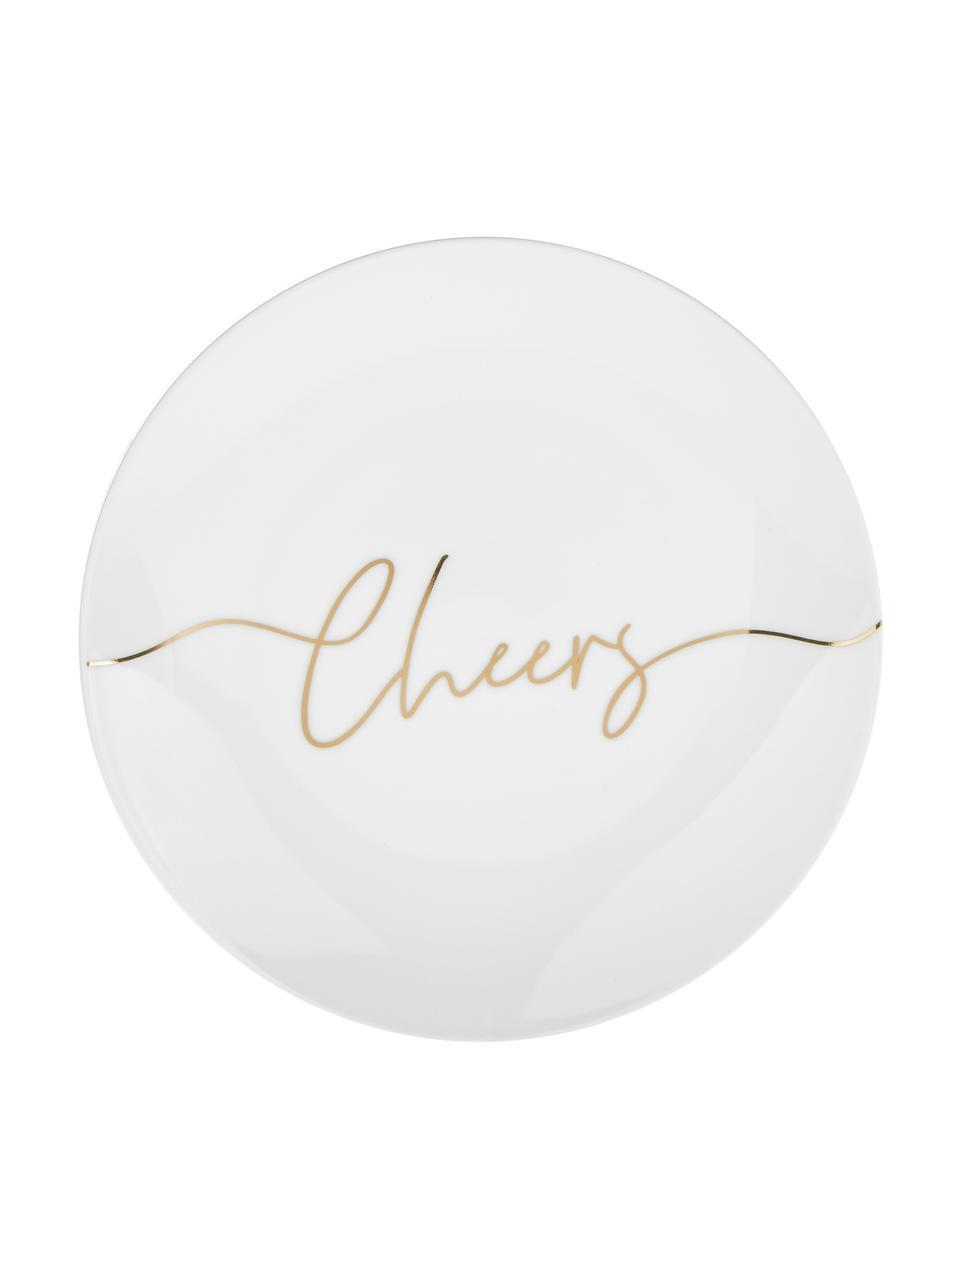 Porzellan Frühstücksteller Cheers mit goldener Aufschrift, 4er-Set, Porzellan, Weiß, Gold, Ø 21 cm